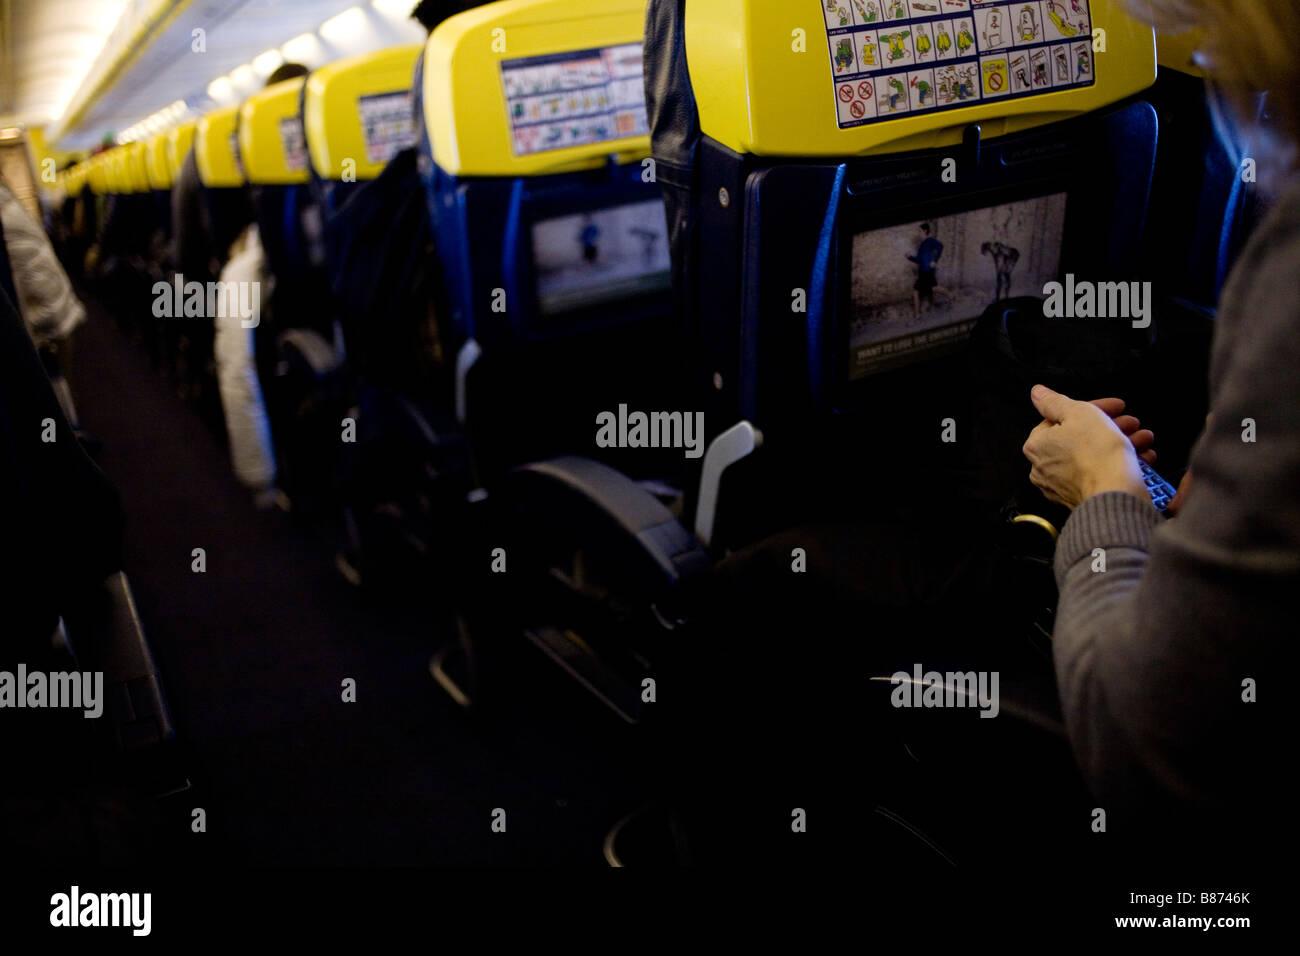 A passenger on a Ryanair flight. - Stock Image